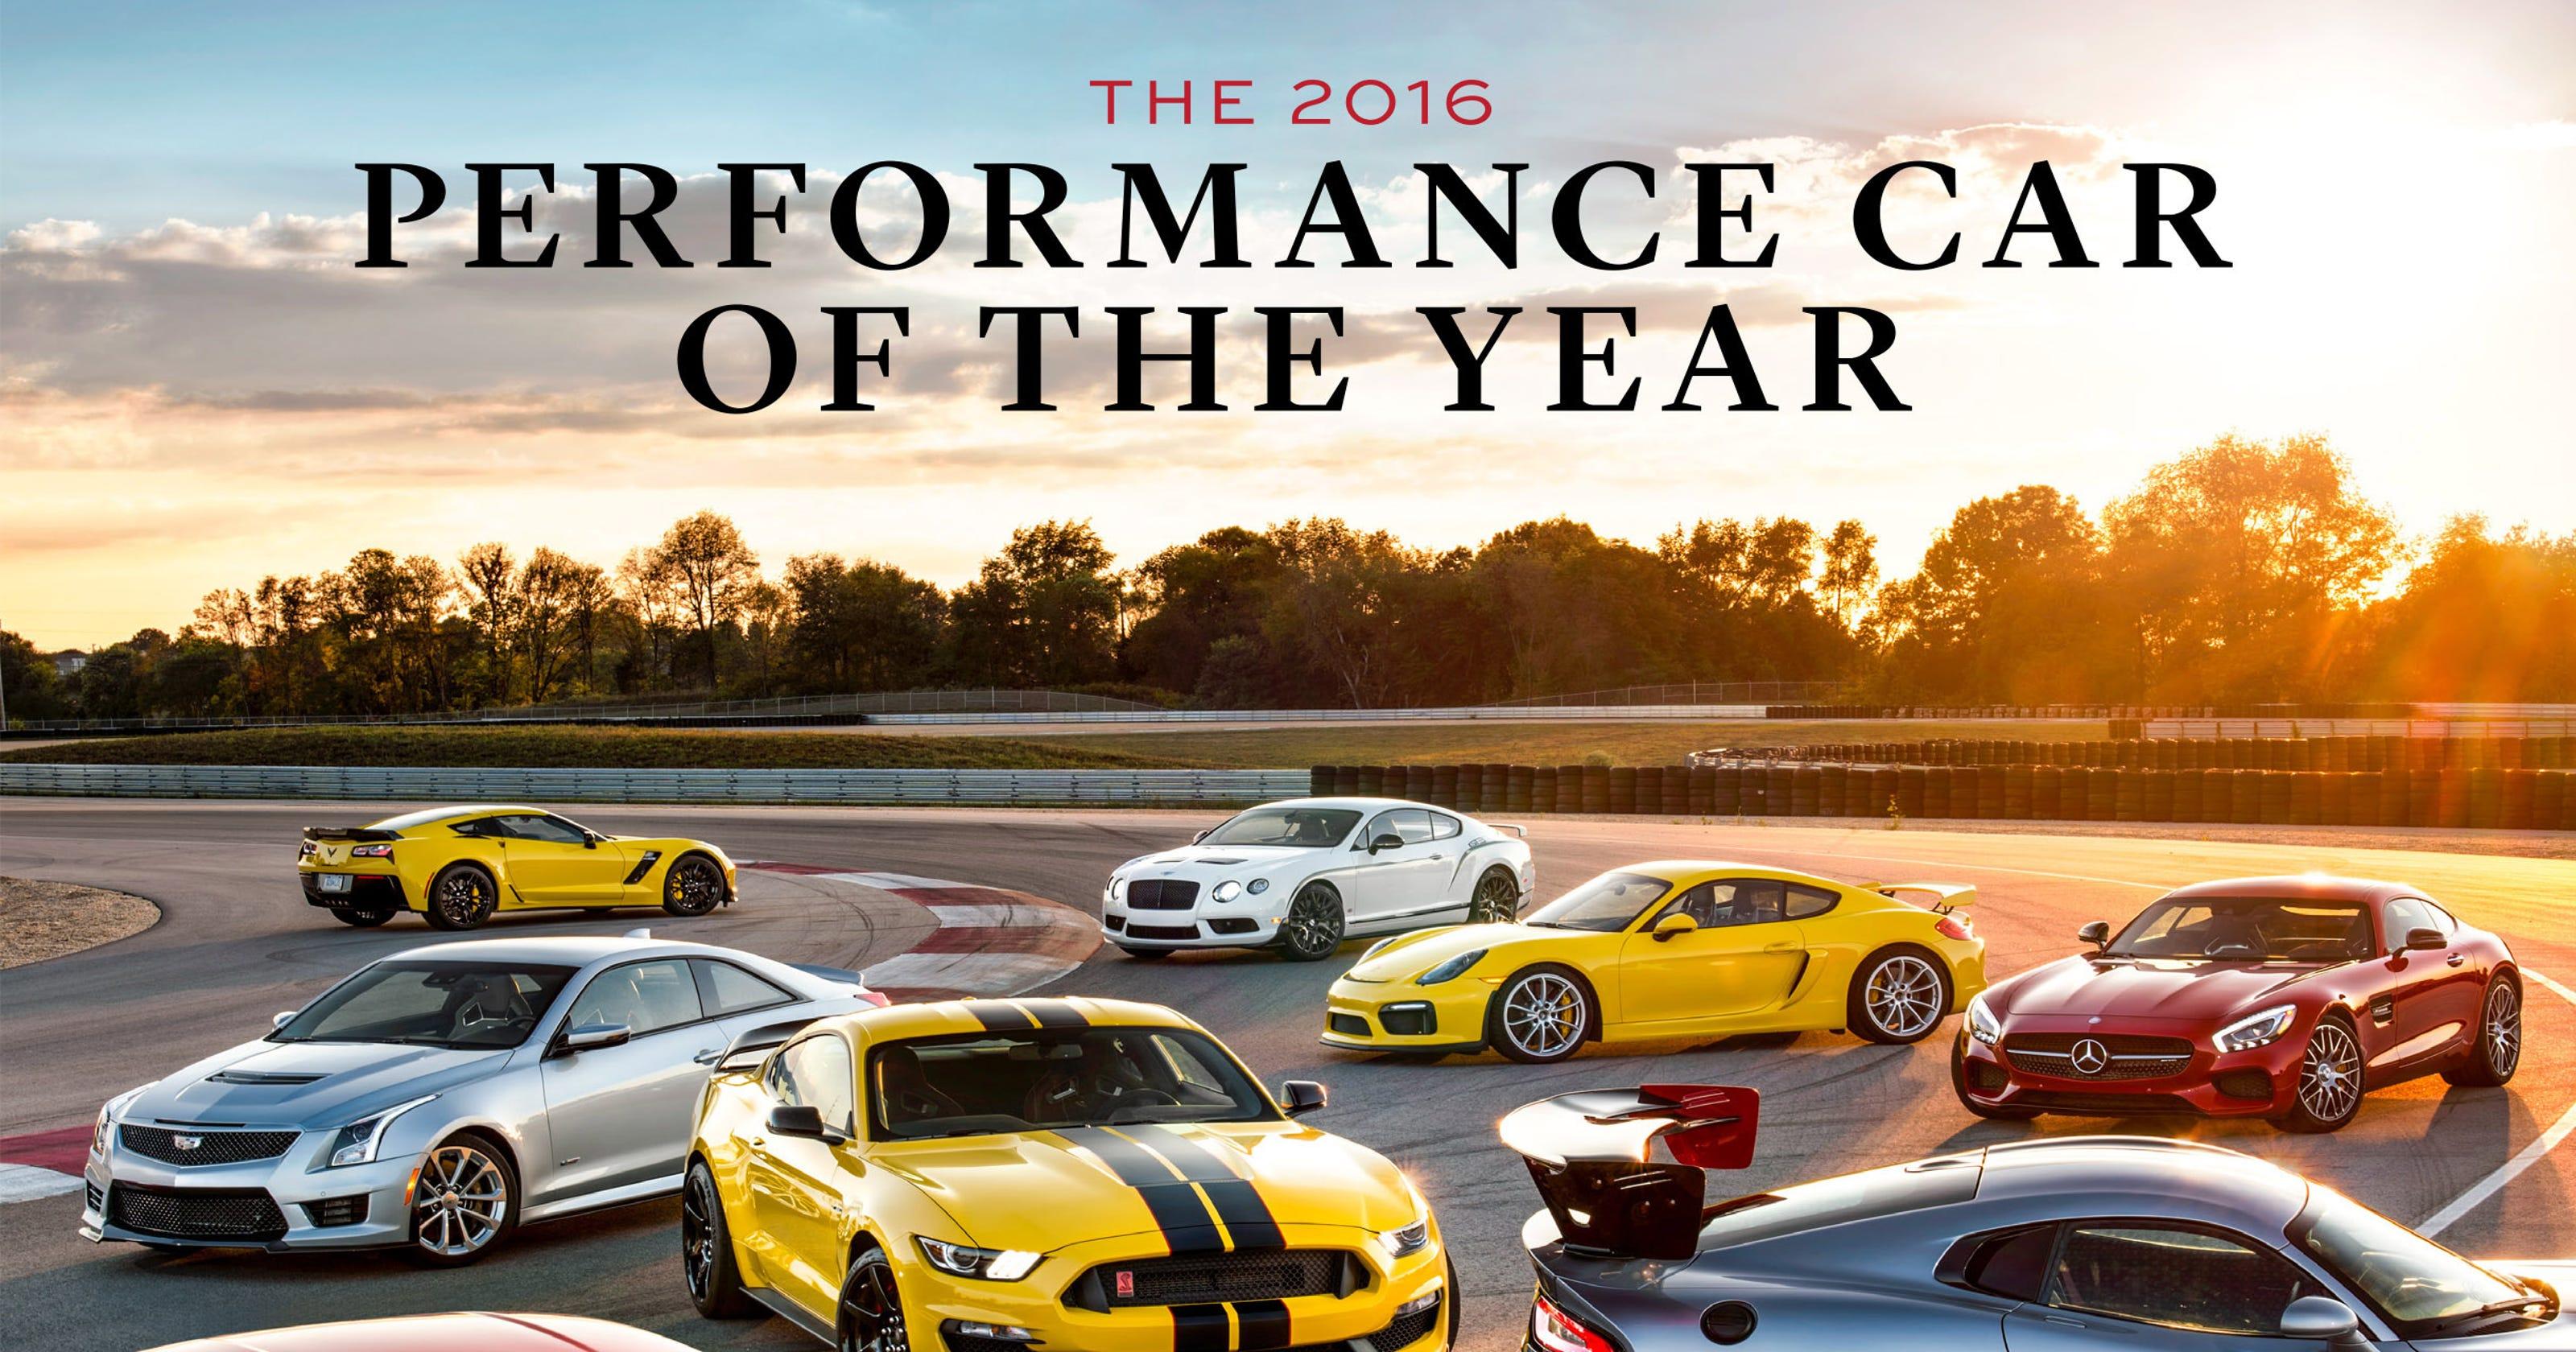 Pay Roadandtrack Com >> Detroit 3 Dominate Road Track Performance Car Contest